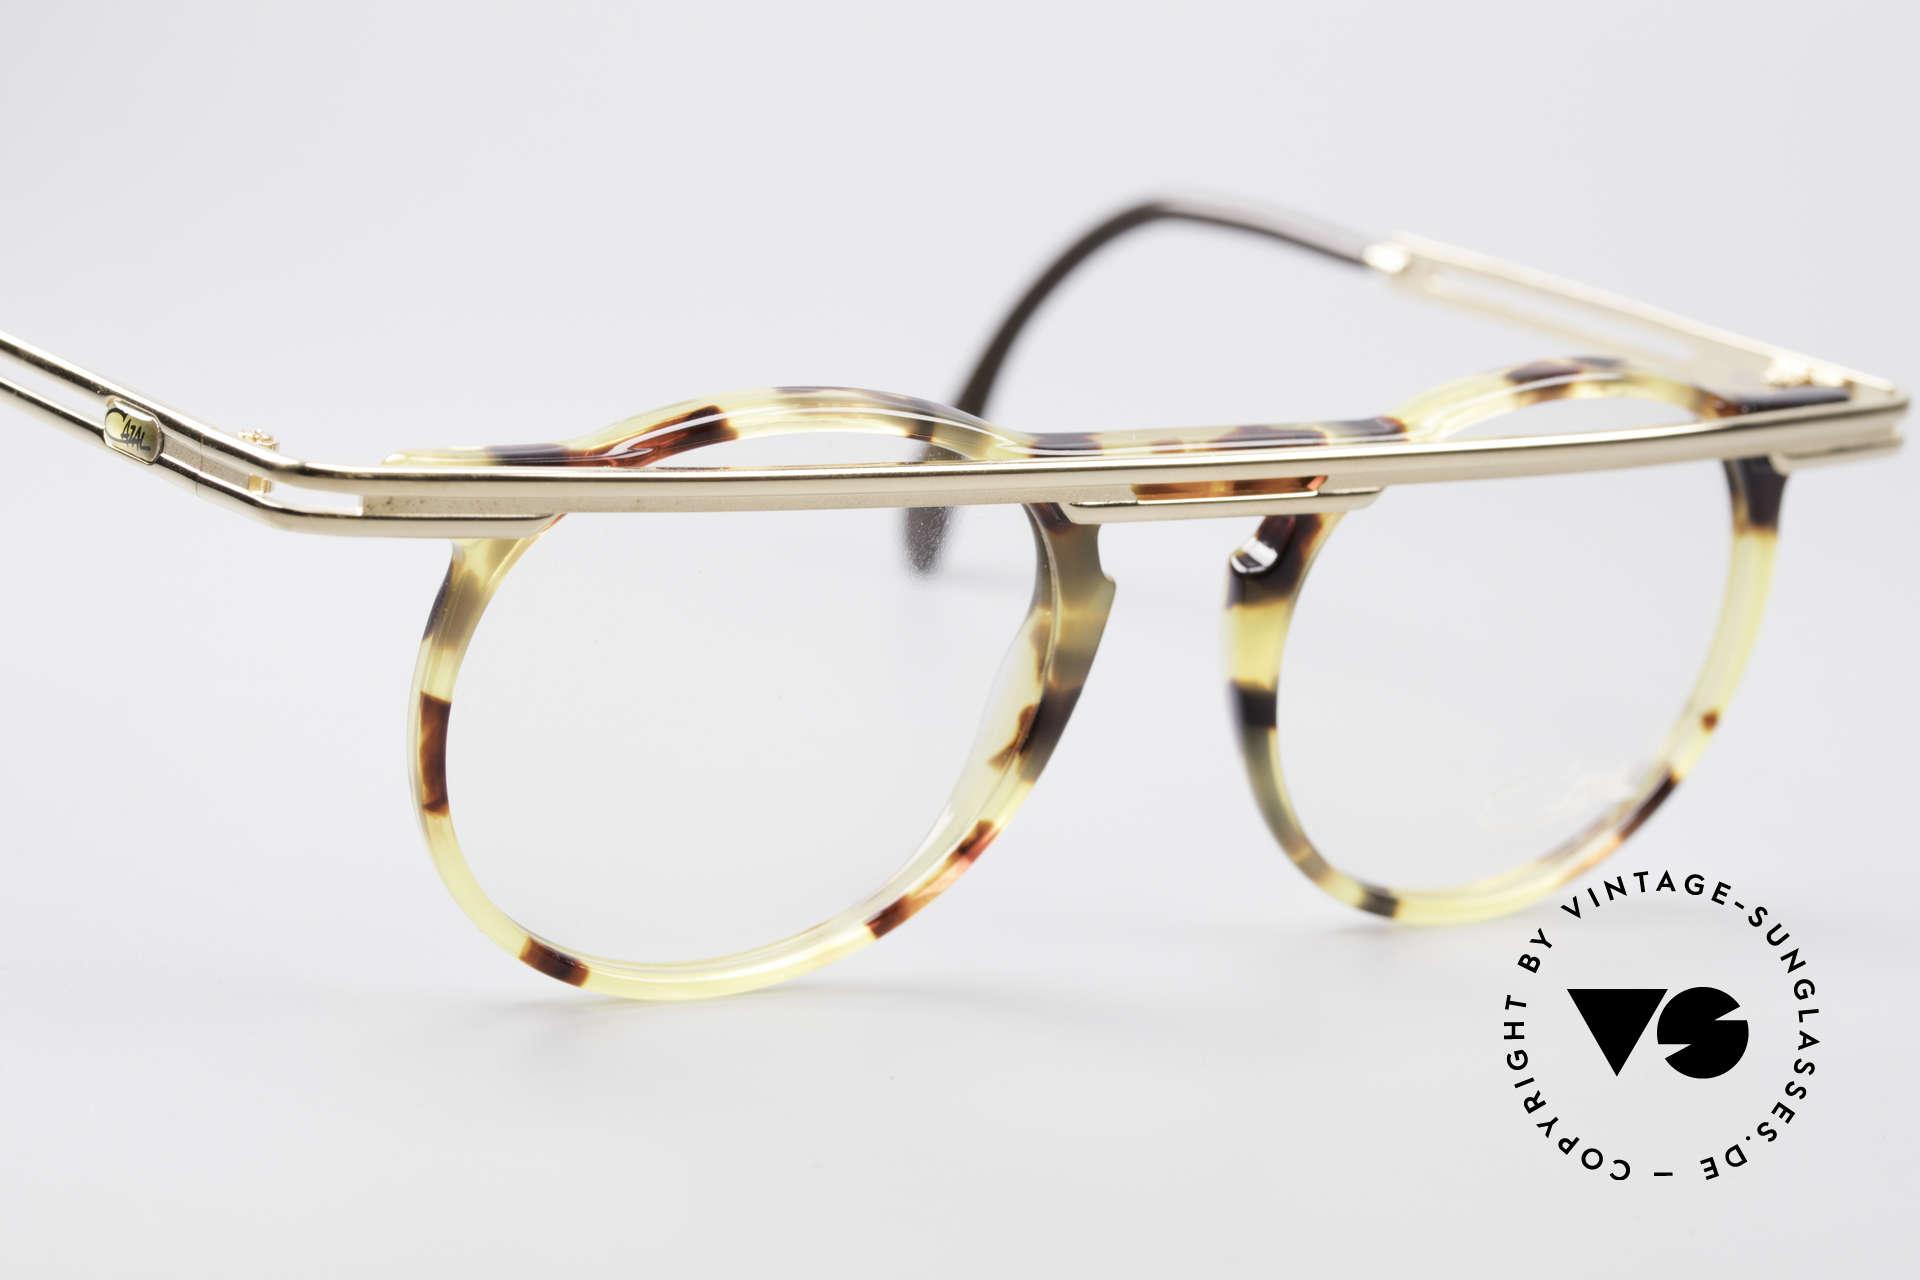 Cazal 648 True 90's Cari Zalloni Glasses, unworn, NOS (like all our rare vintage Cazal glasses), Made for Men and Women